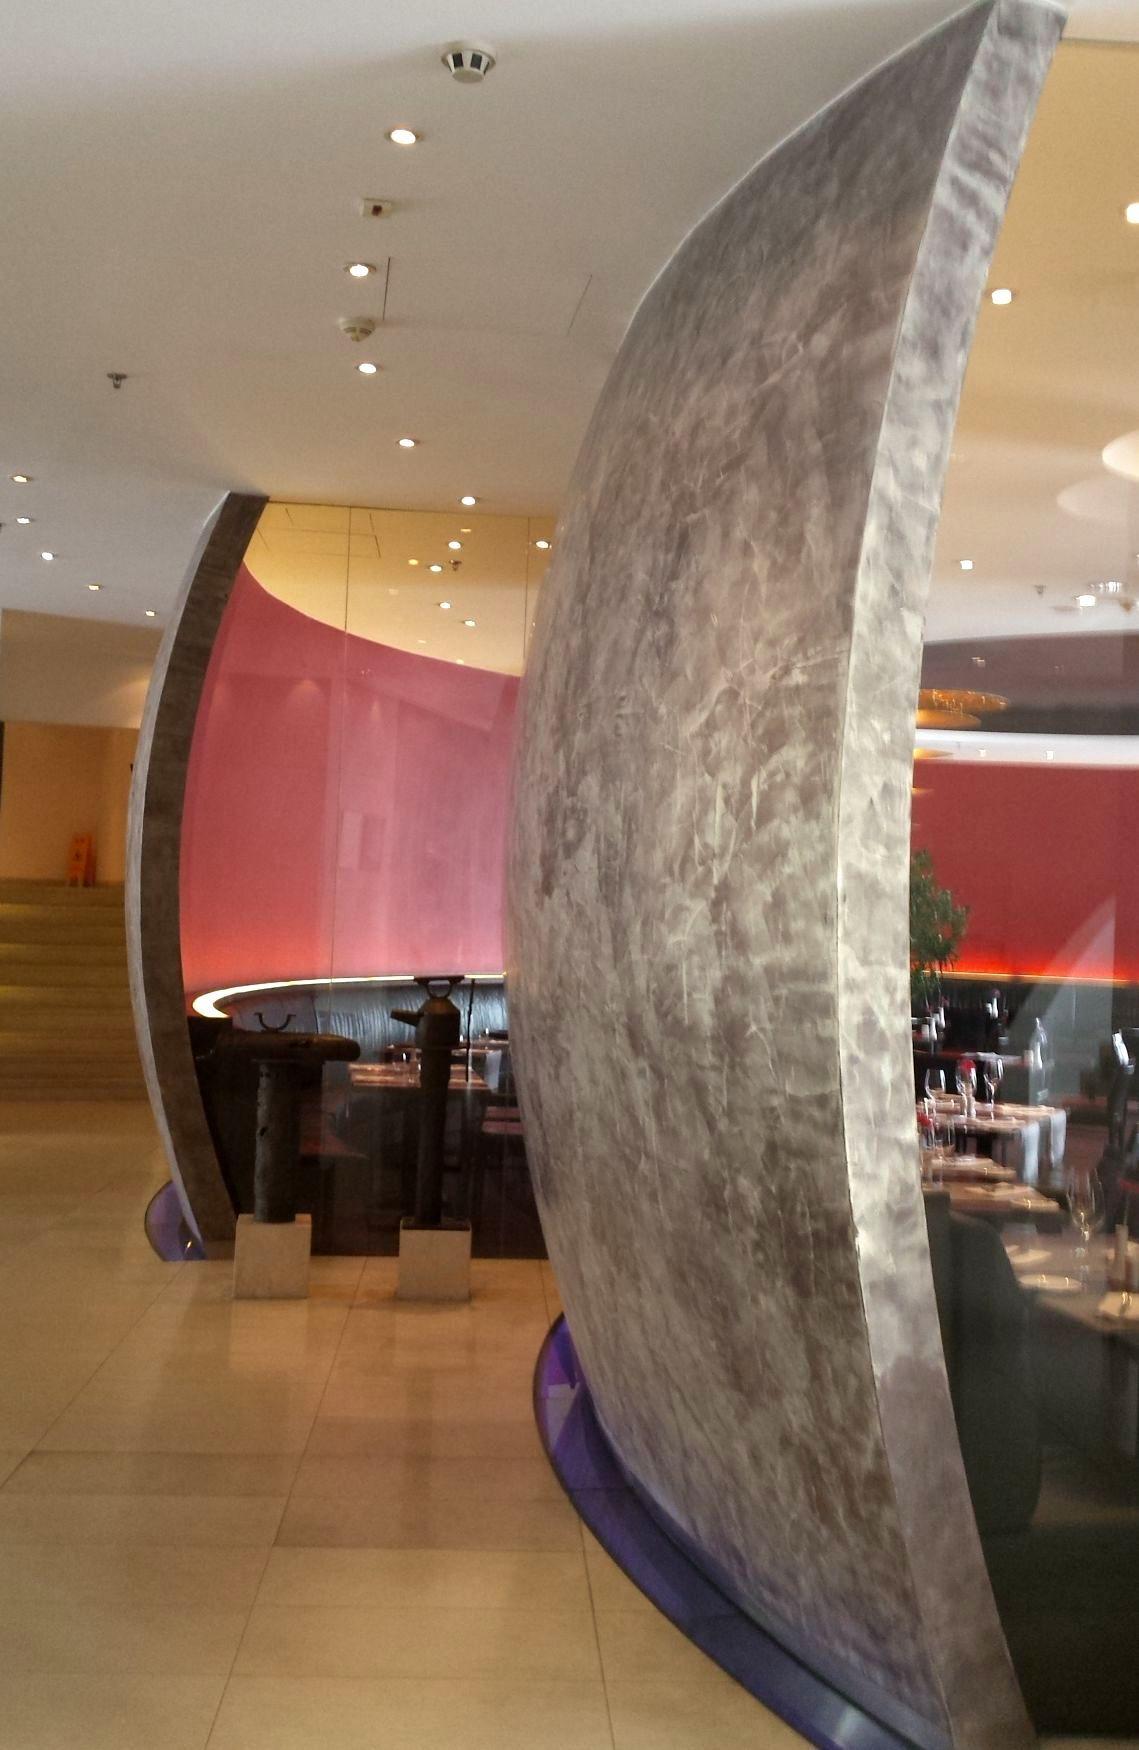 Hotelgestaltung, Wandgestaltung in Spachteltechnik http://www ...